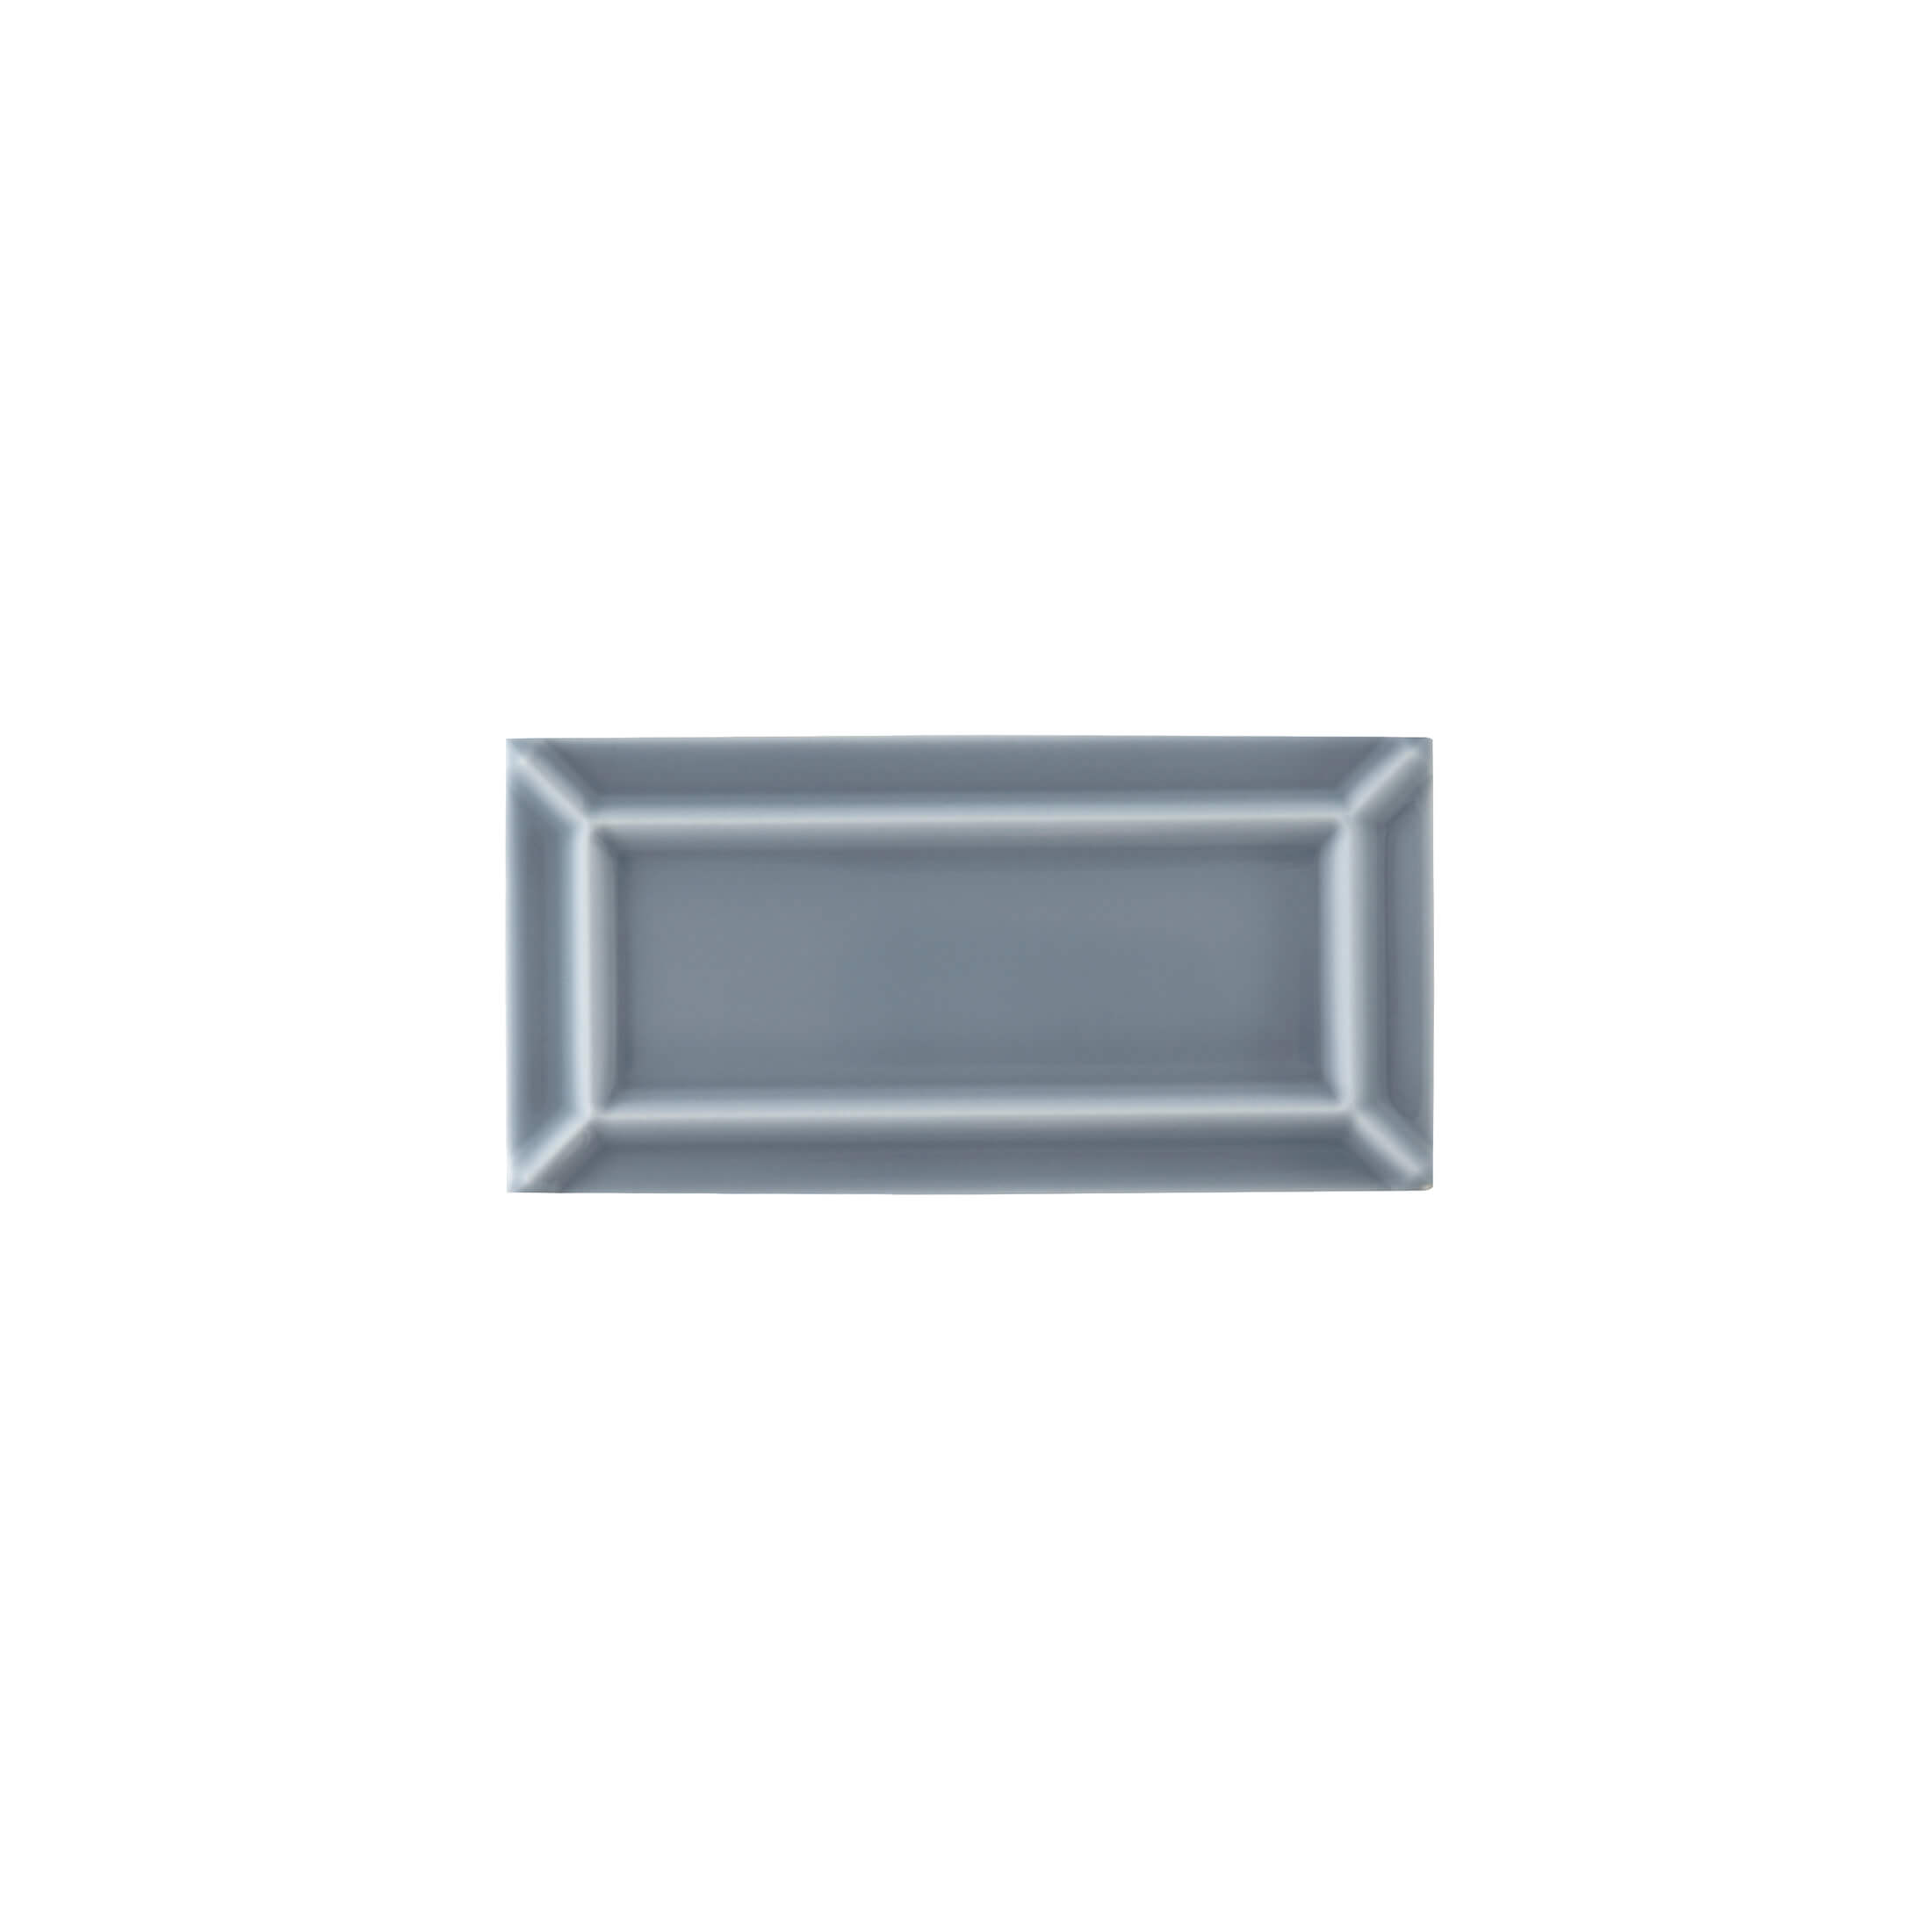 ADNE1107 - LISO EDGE - 7.5 cm X 15 cm